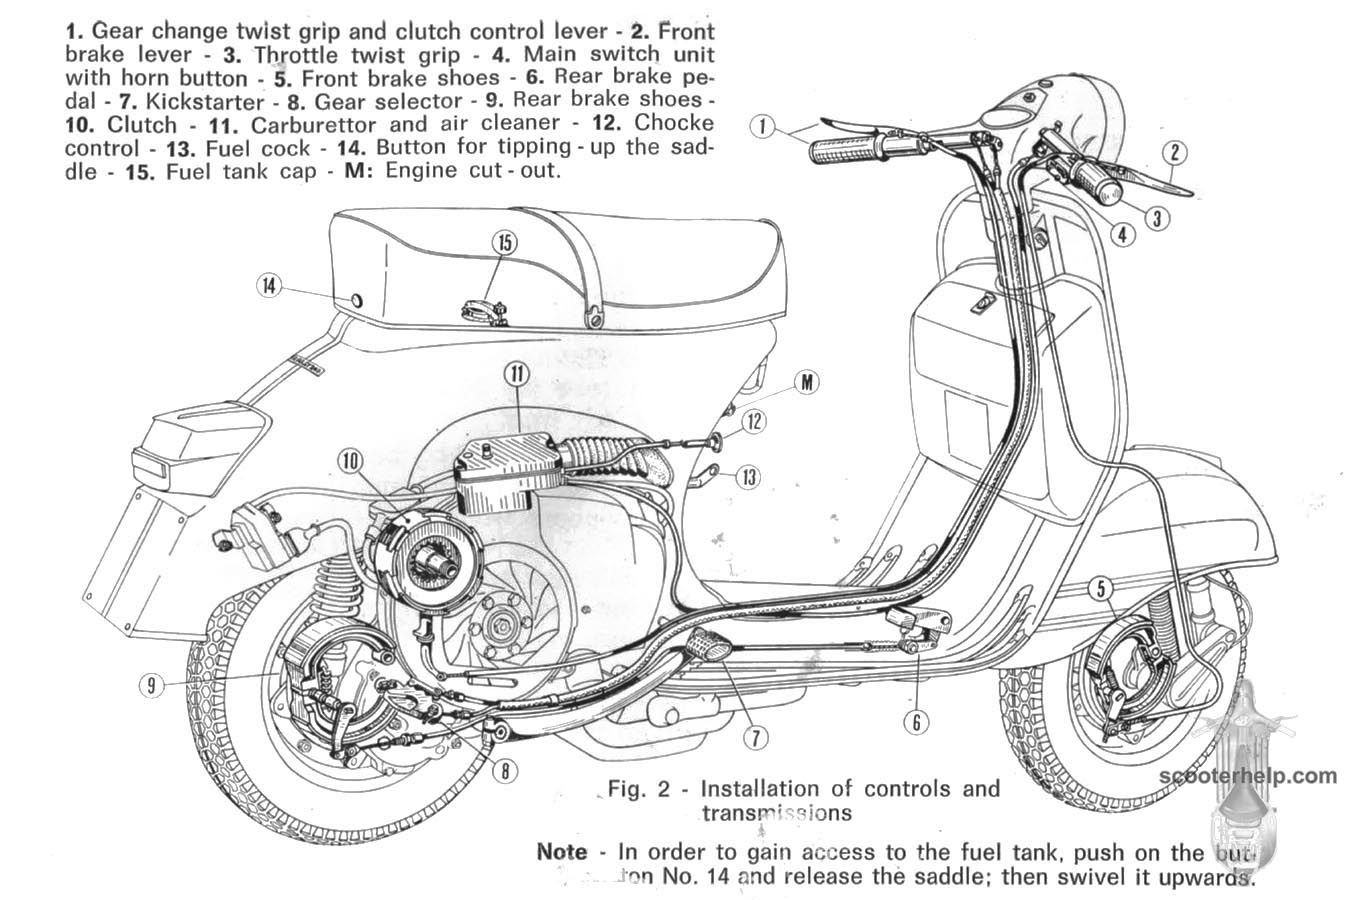 Scooterhelp Manuals Vse1tnual 07